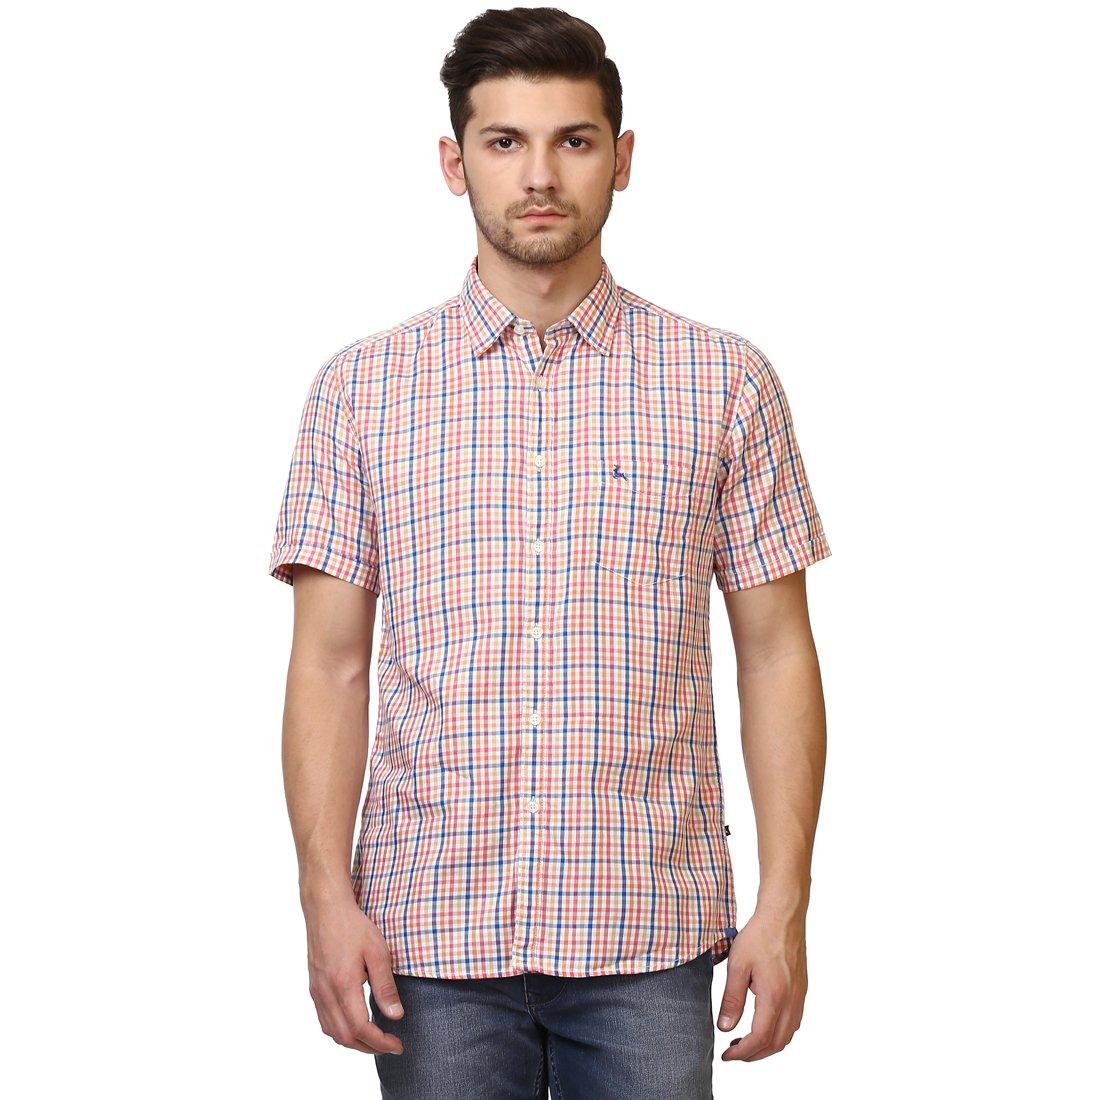 7d186a0e84 Parx Half Sleeve Regular Collar Slim Fit Medium Orange Cotton Checks Shirt  for Men: Amazon.in: Clothing & Accessories